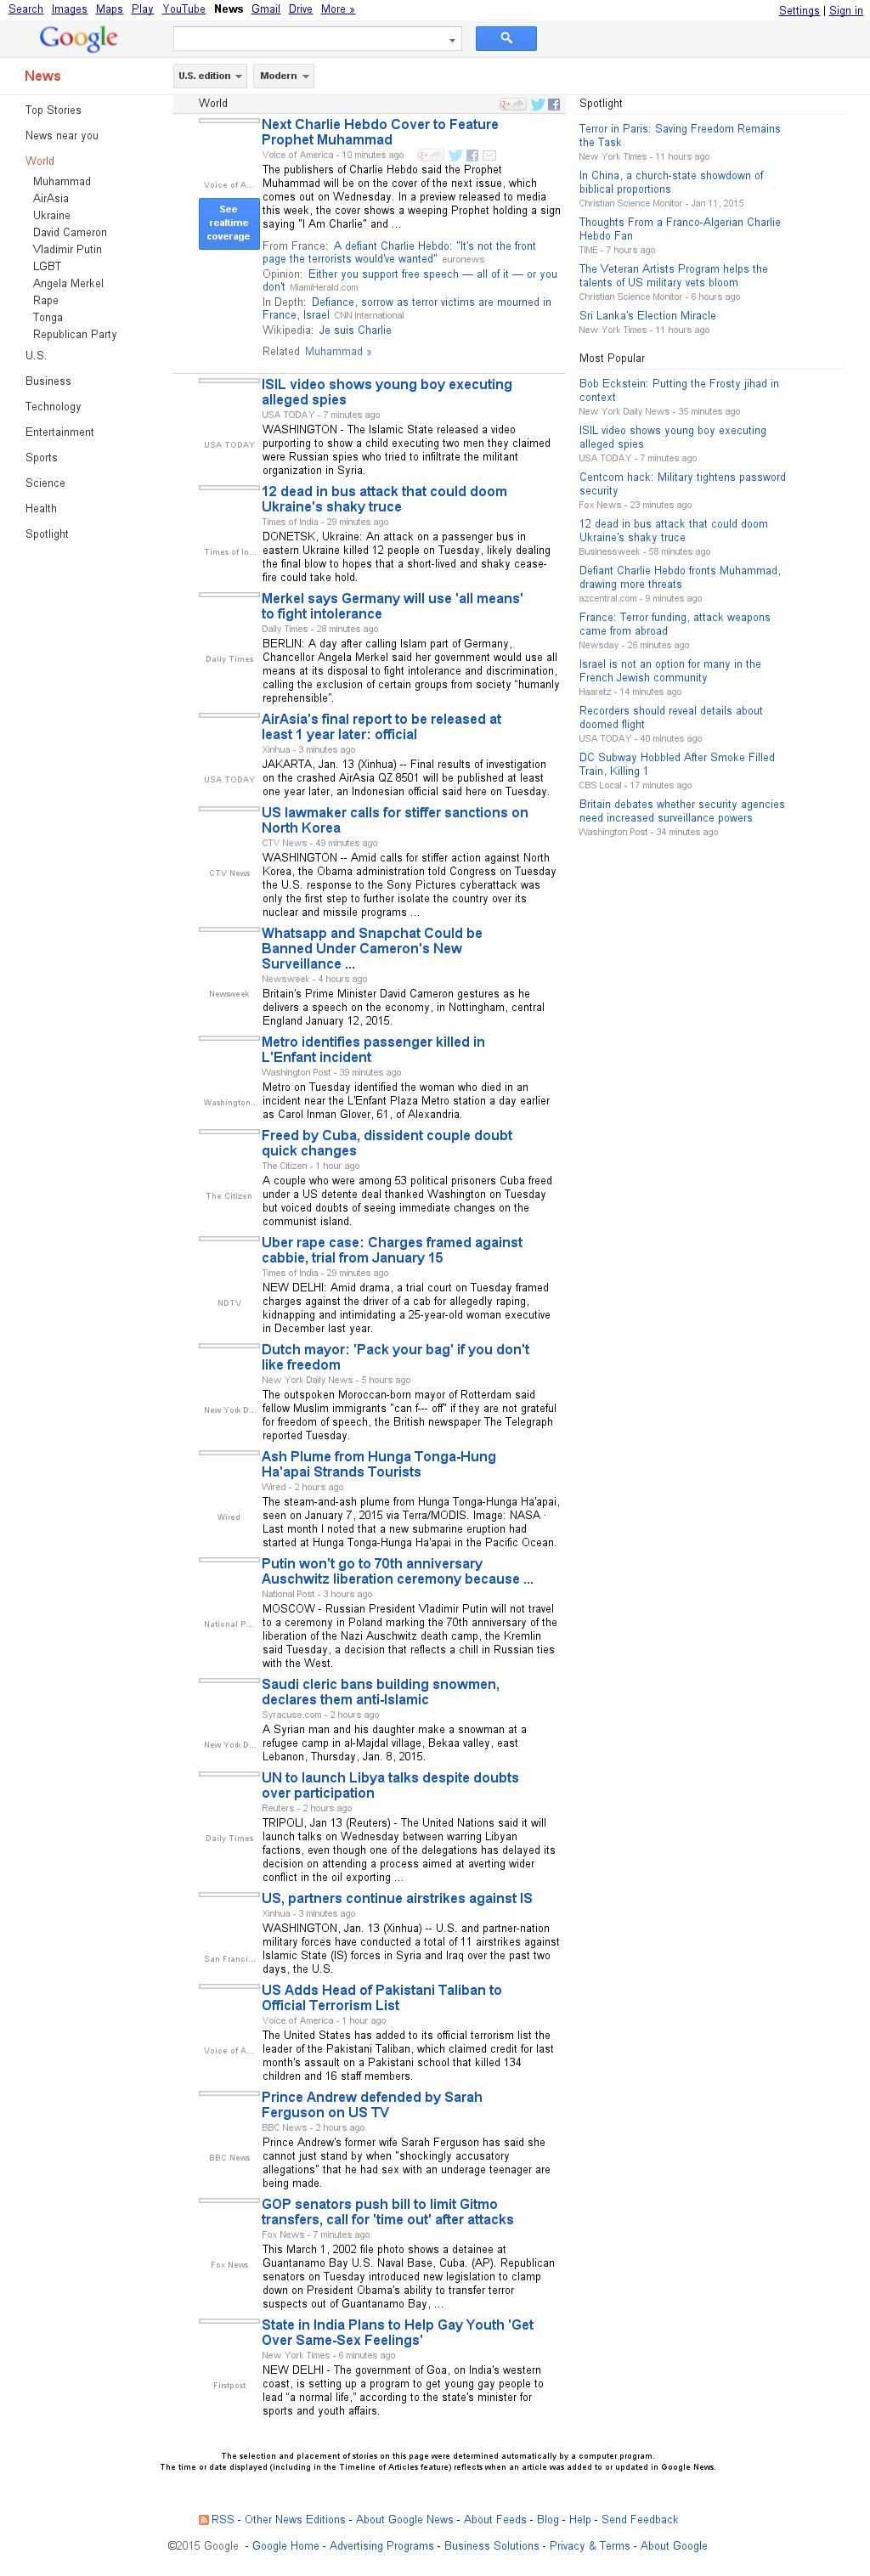 Google News: World at Tuesday Jan. 13, 2015, 11:11 p.m. UTC